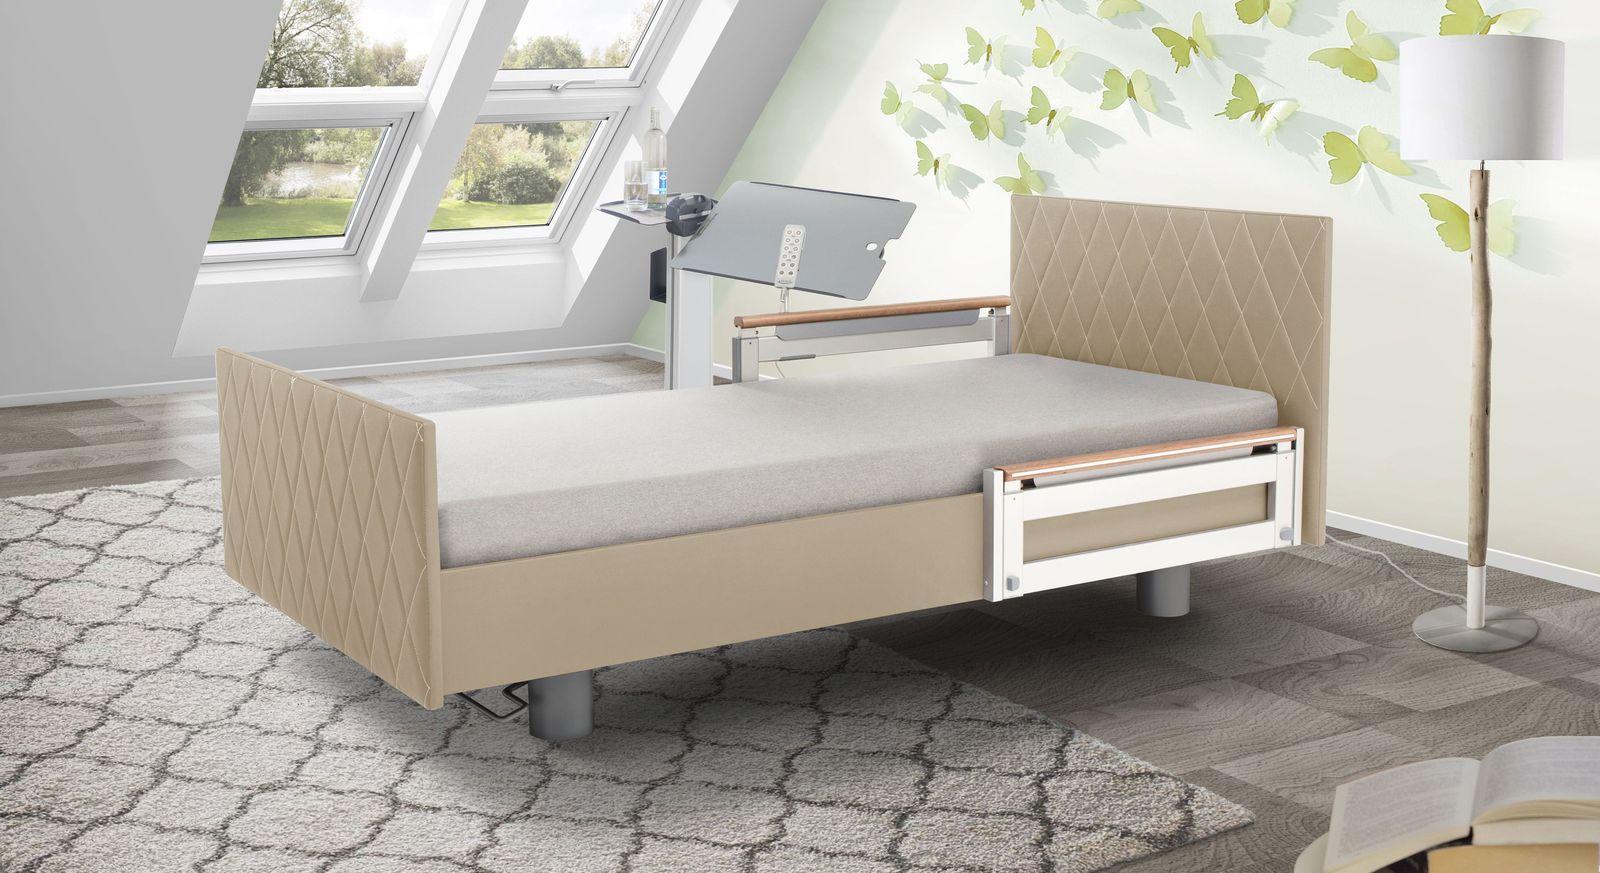 Komfortbett mit Pflegebett-Funktion Borkum mit leinefarbenem Kunstlederbezug